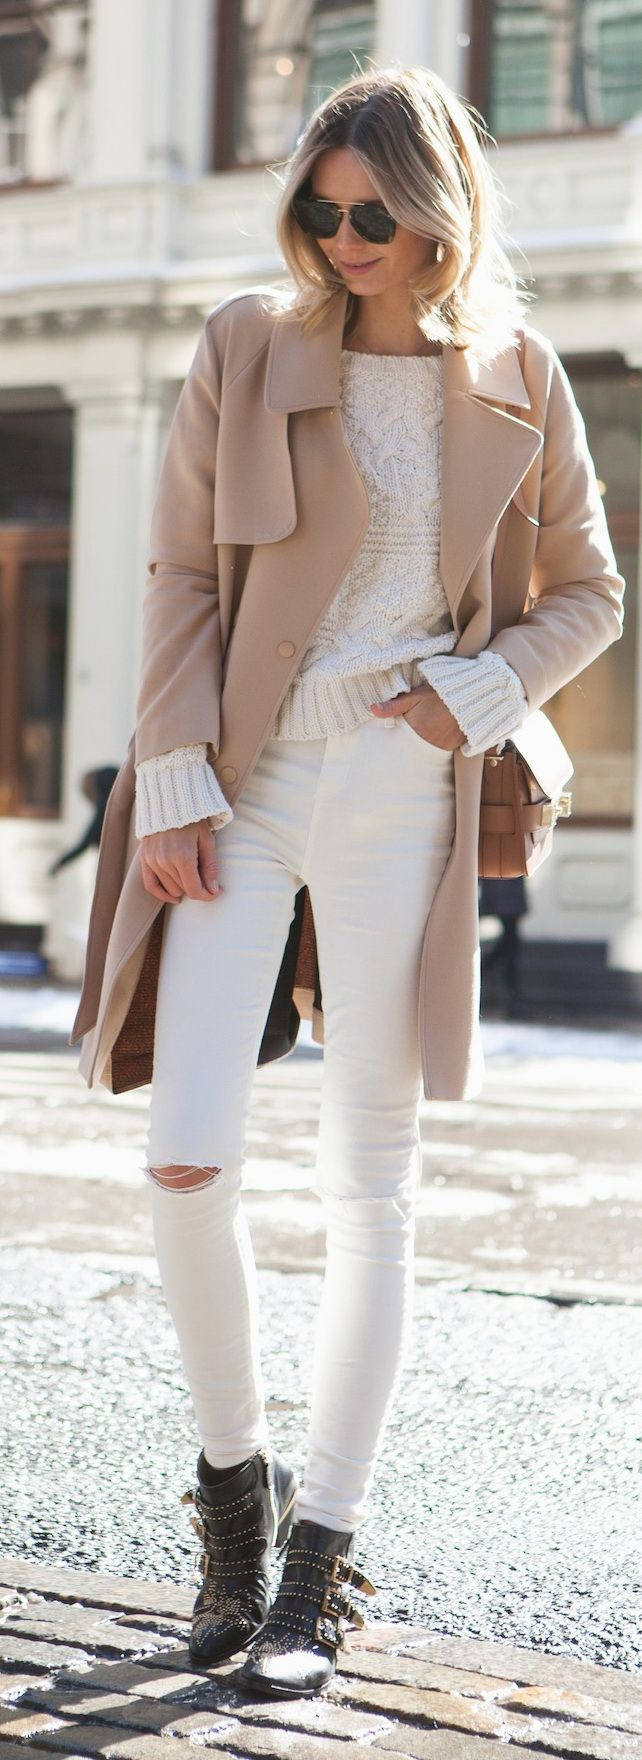 Asos trench, Zara knit, Topshop jeans, Chloe boots, Proenza Schouler bag, Celine sunglasses.